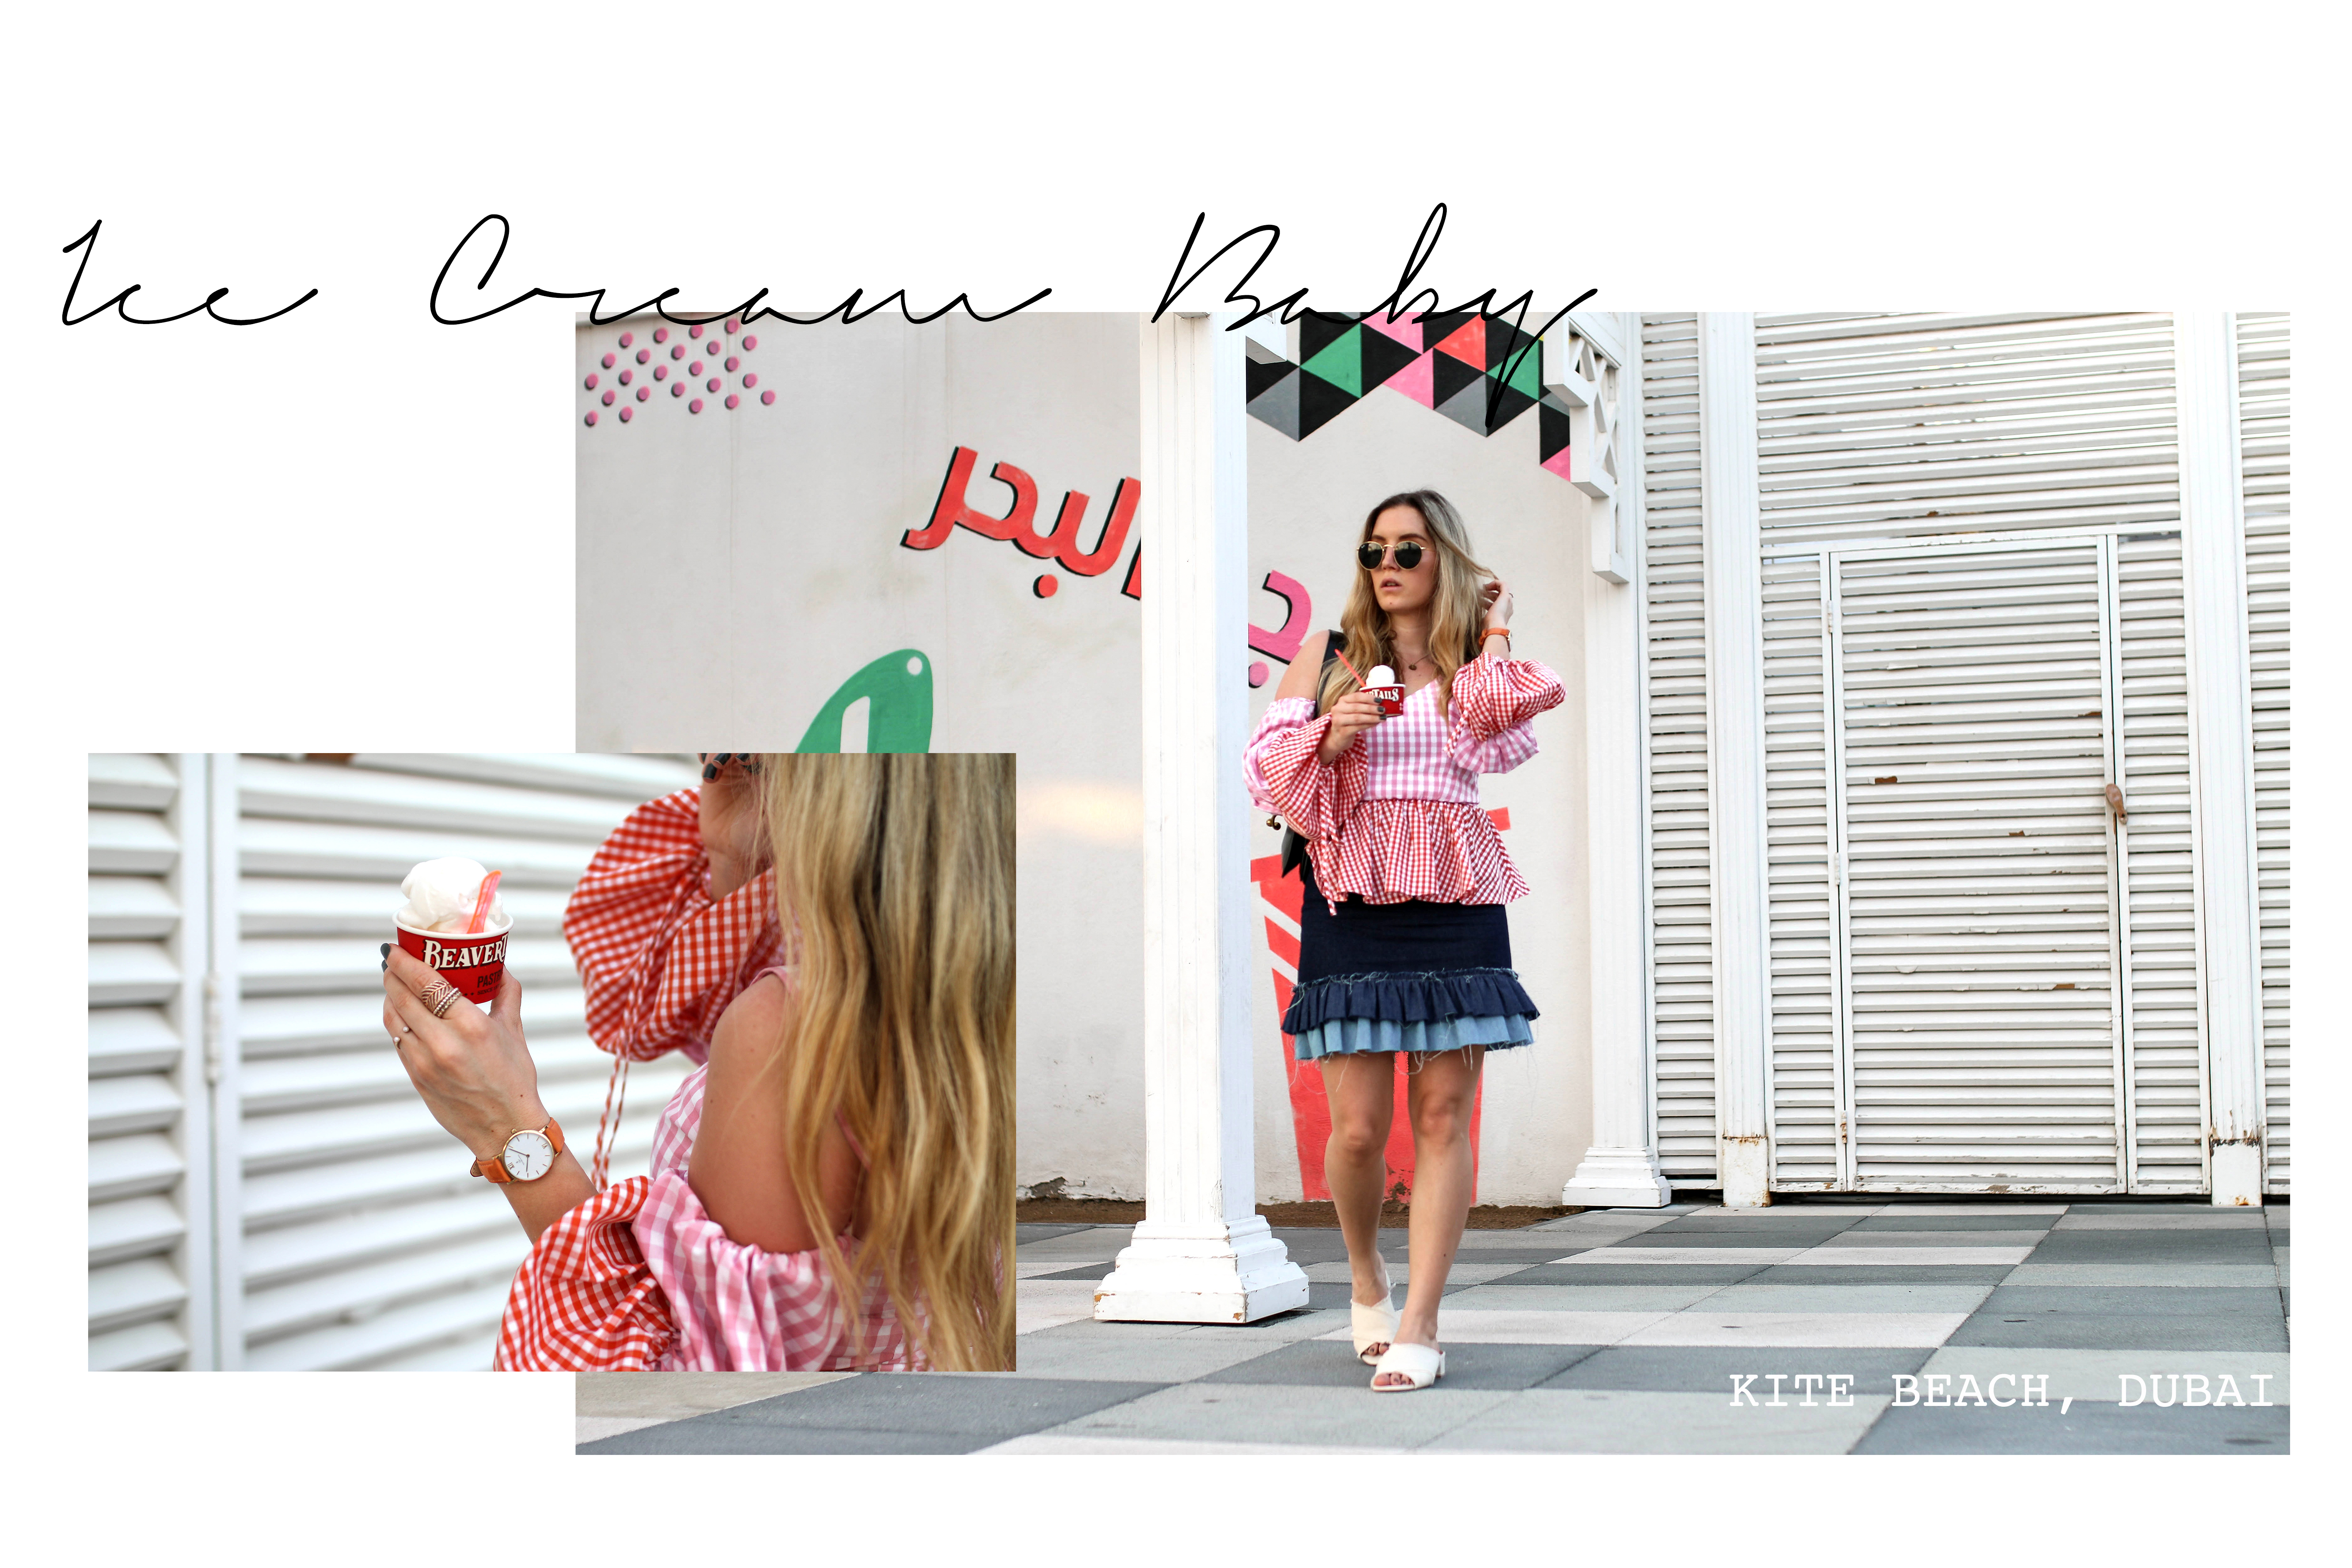 vichy check print trend asos vichy check blouse asseenonme 90s trend fashion blog dubai kite beach